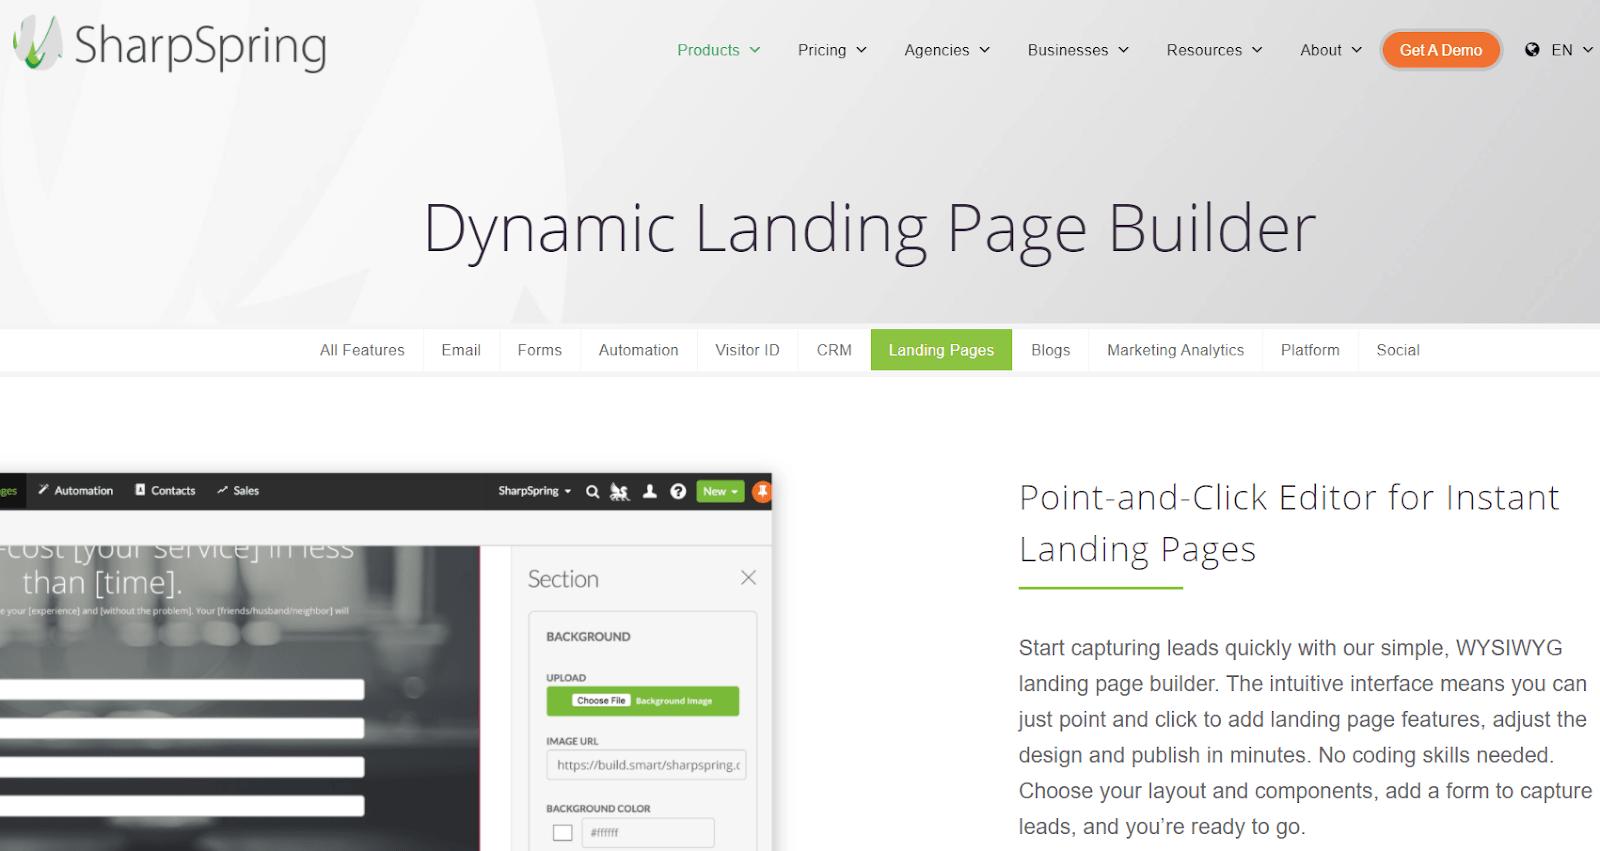 SharpSpring landing page builder